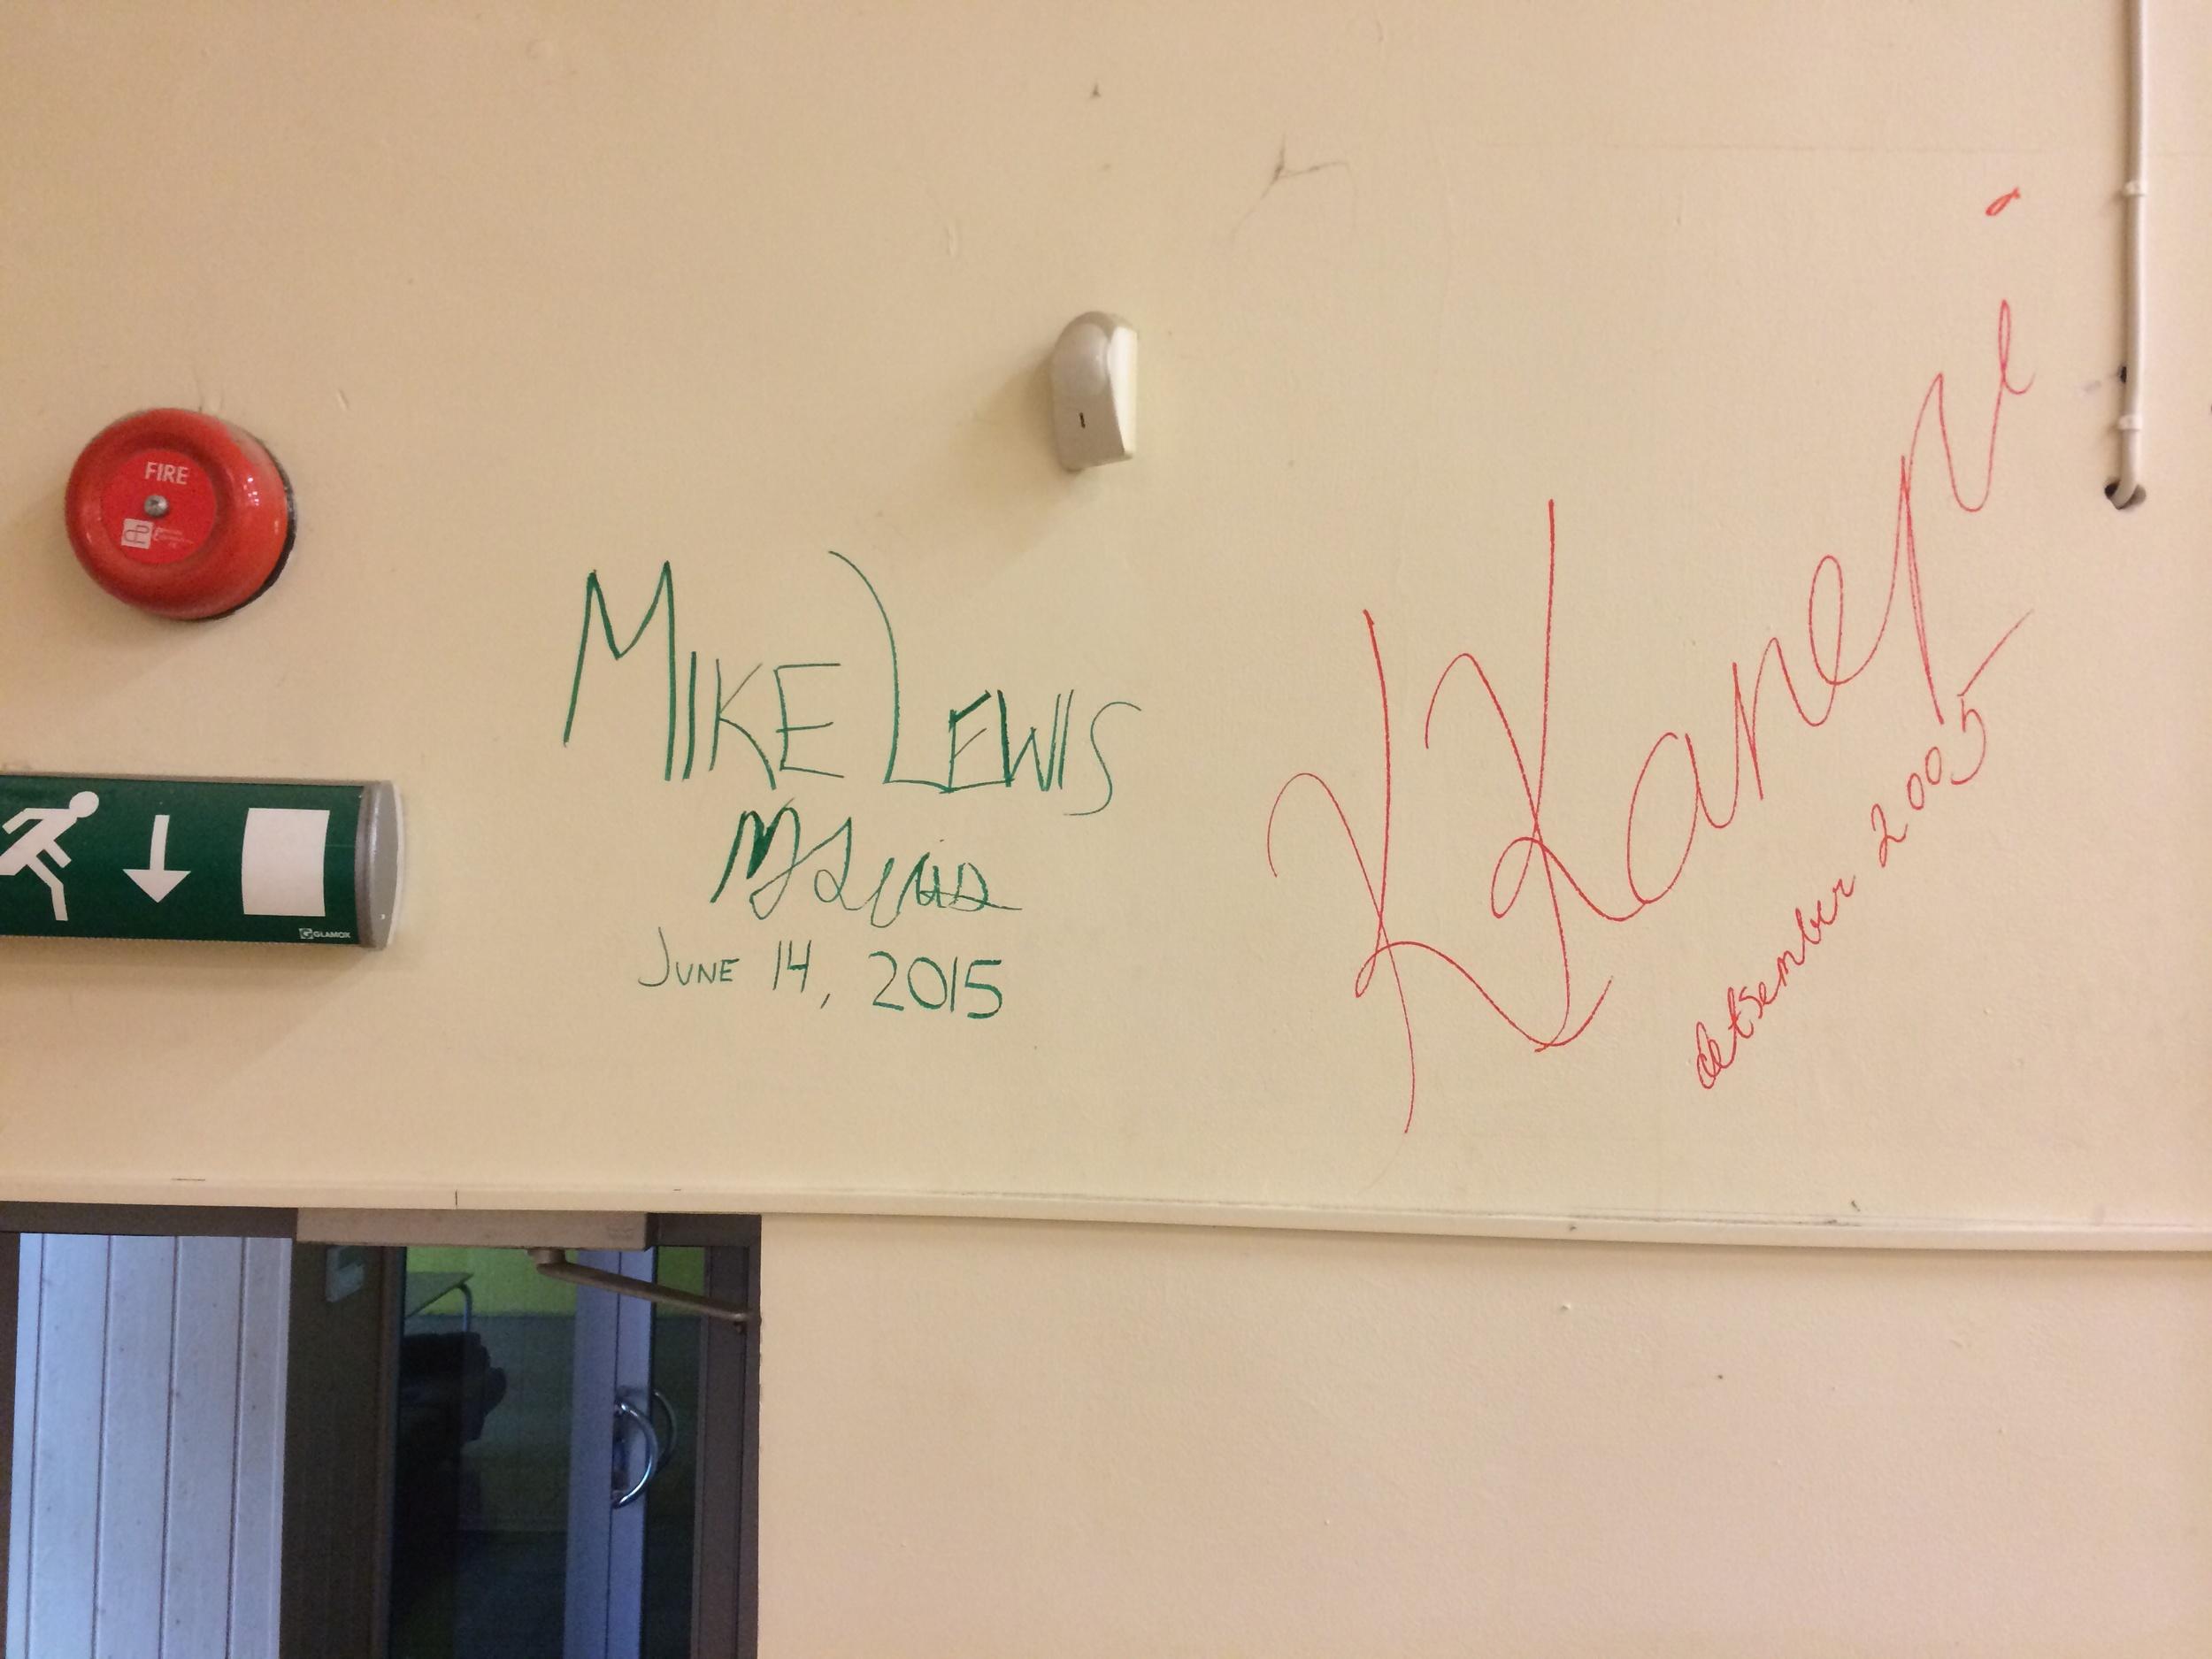 Signed the wall at Aliis' club in Pärnu. I'll be back.